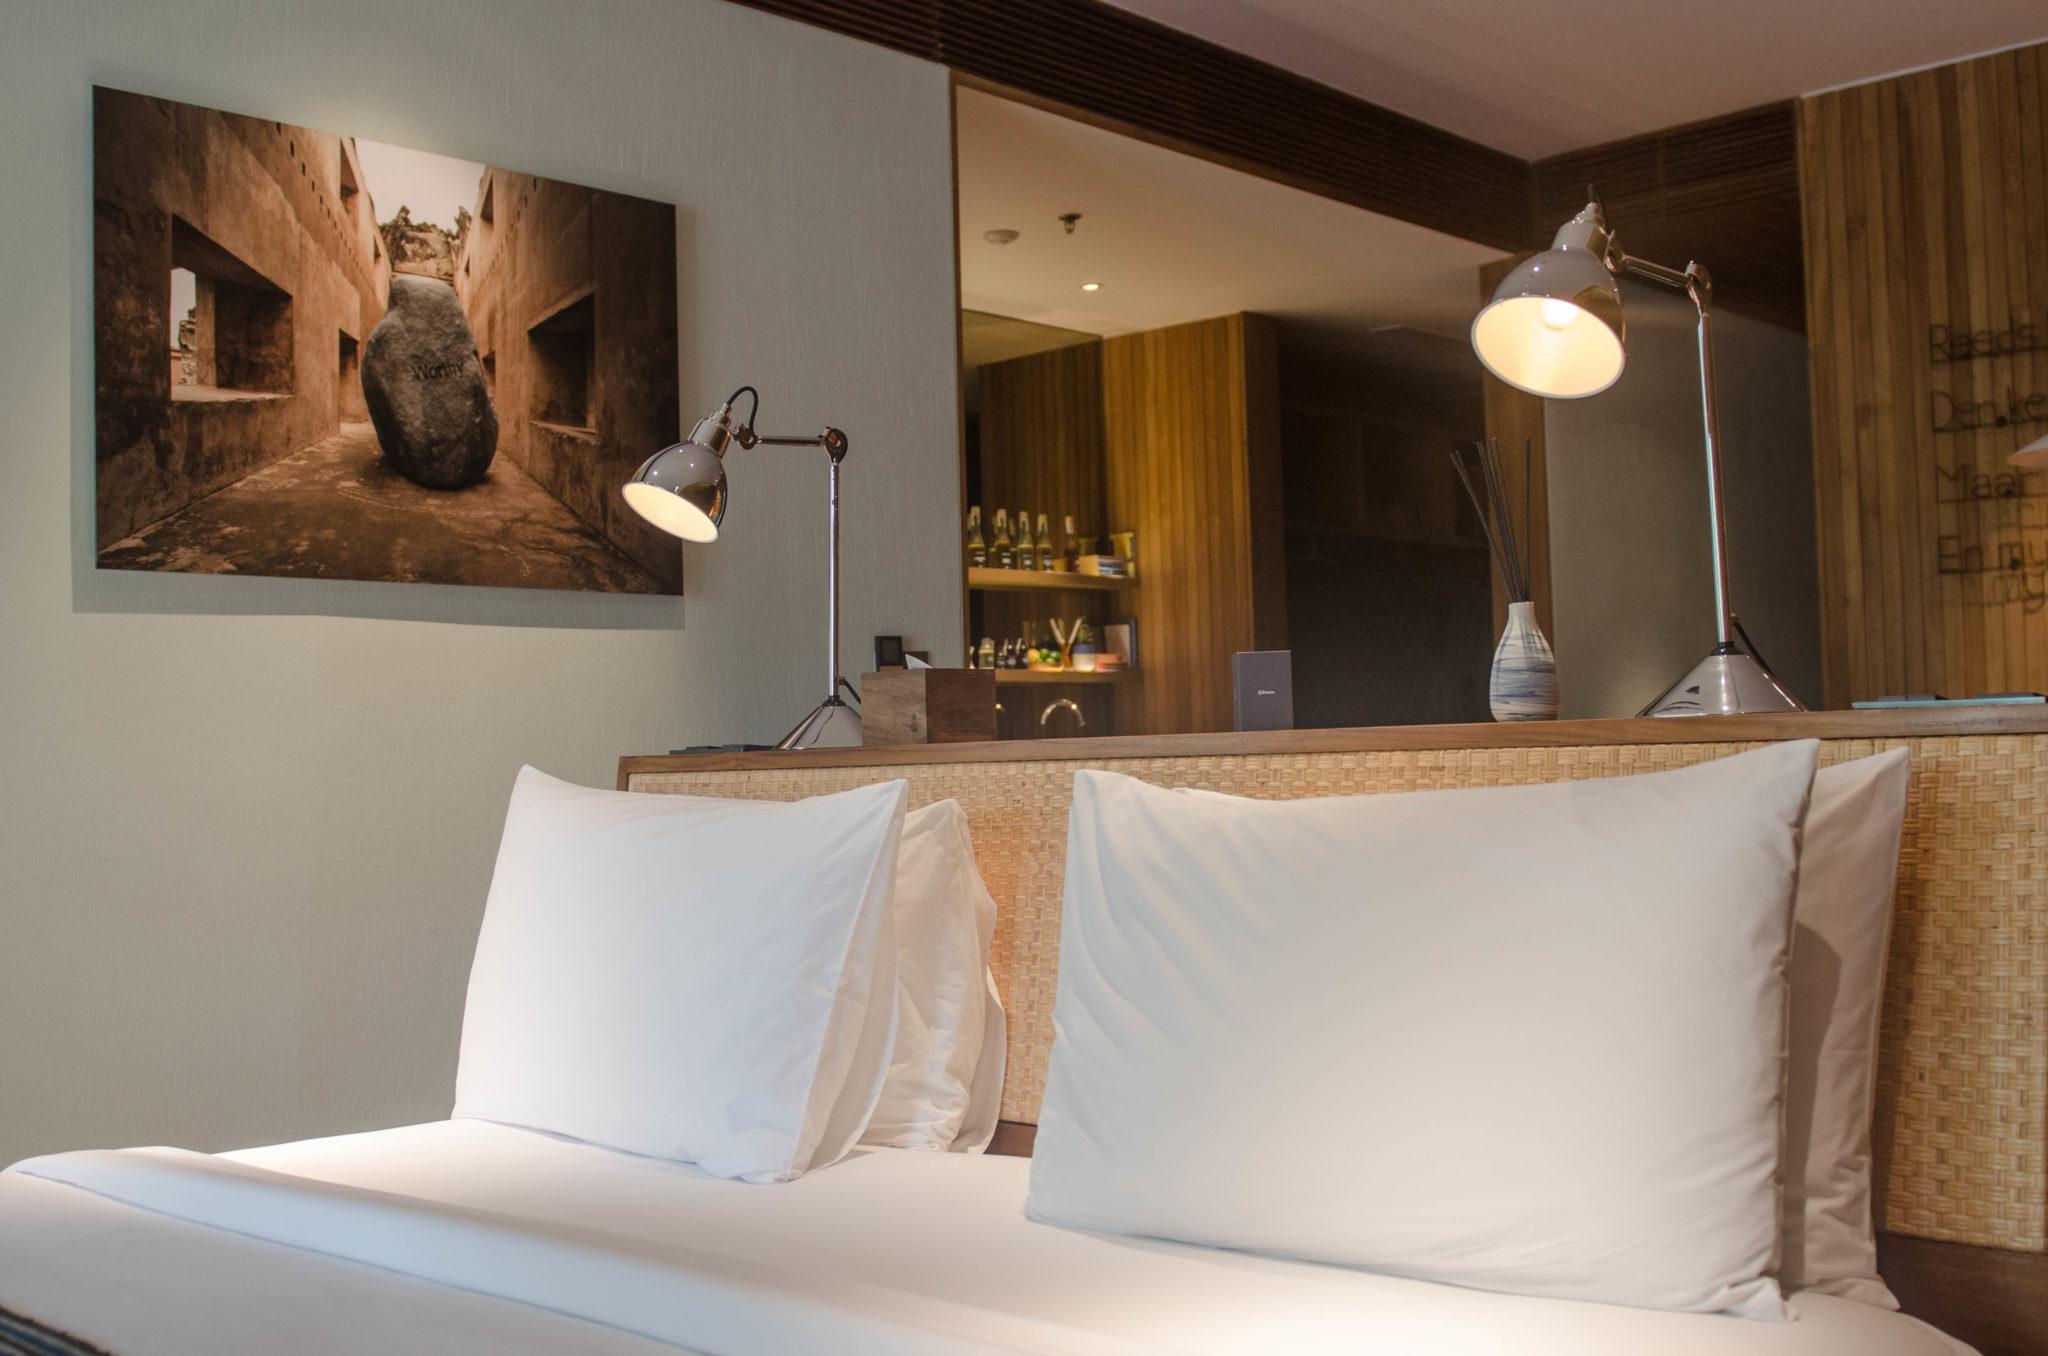 Das Zimmer im Katamama Hotel Bali